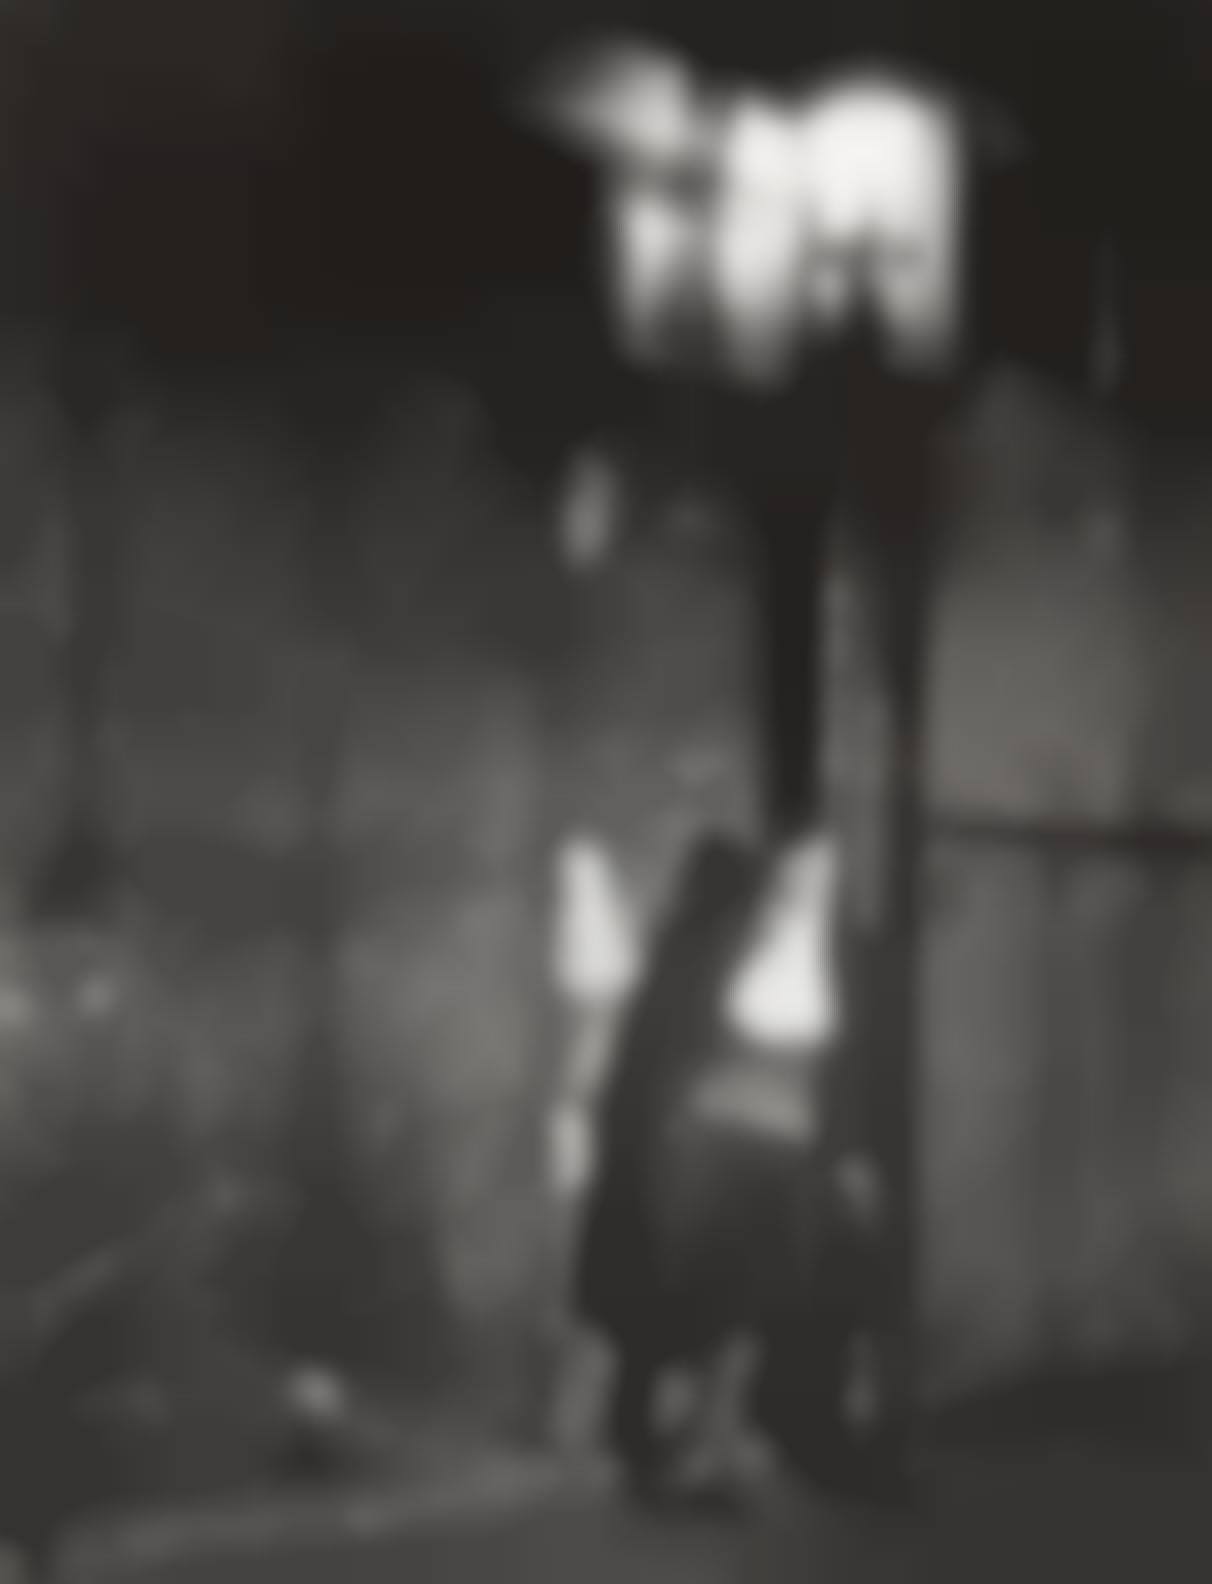 Brassai-Fille Adossee A Un Mur A Lecharpe Herminette, 1930s-